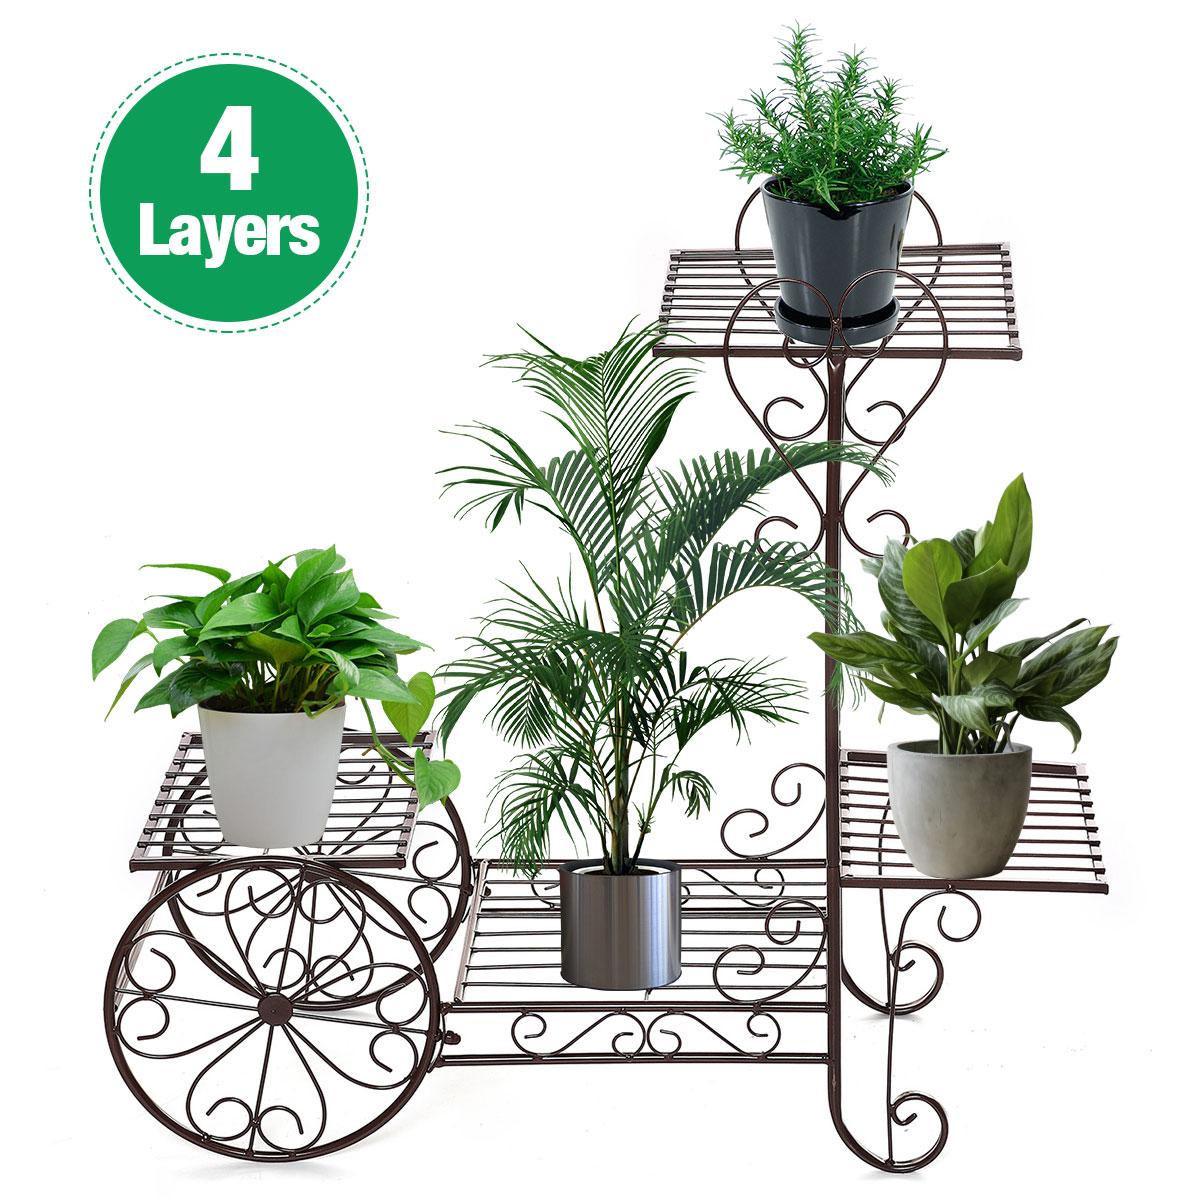 European 4 Layers Plants Stand Flower Rack Metal Flower Stand Indoor Plant Shelves Multi-story Outdoor Metal Floor Shelf Balcony